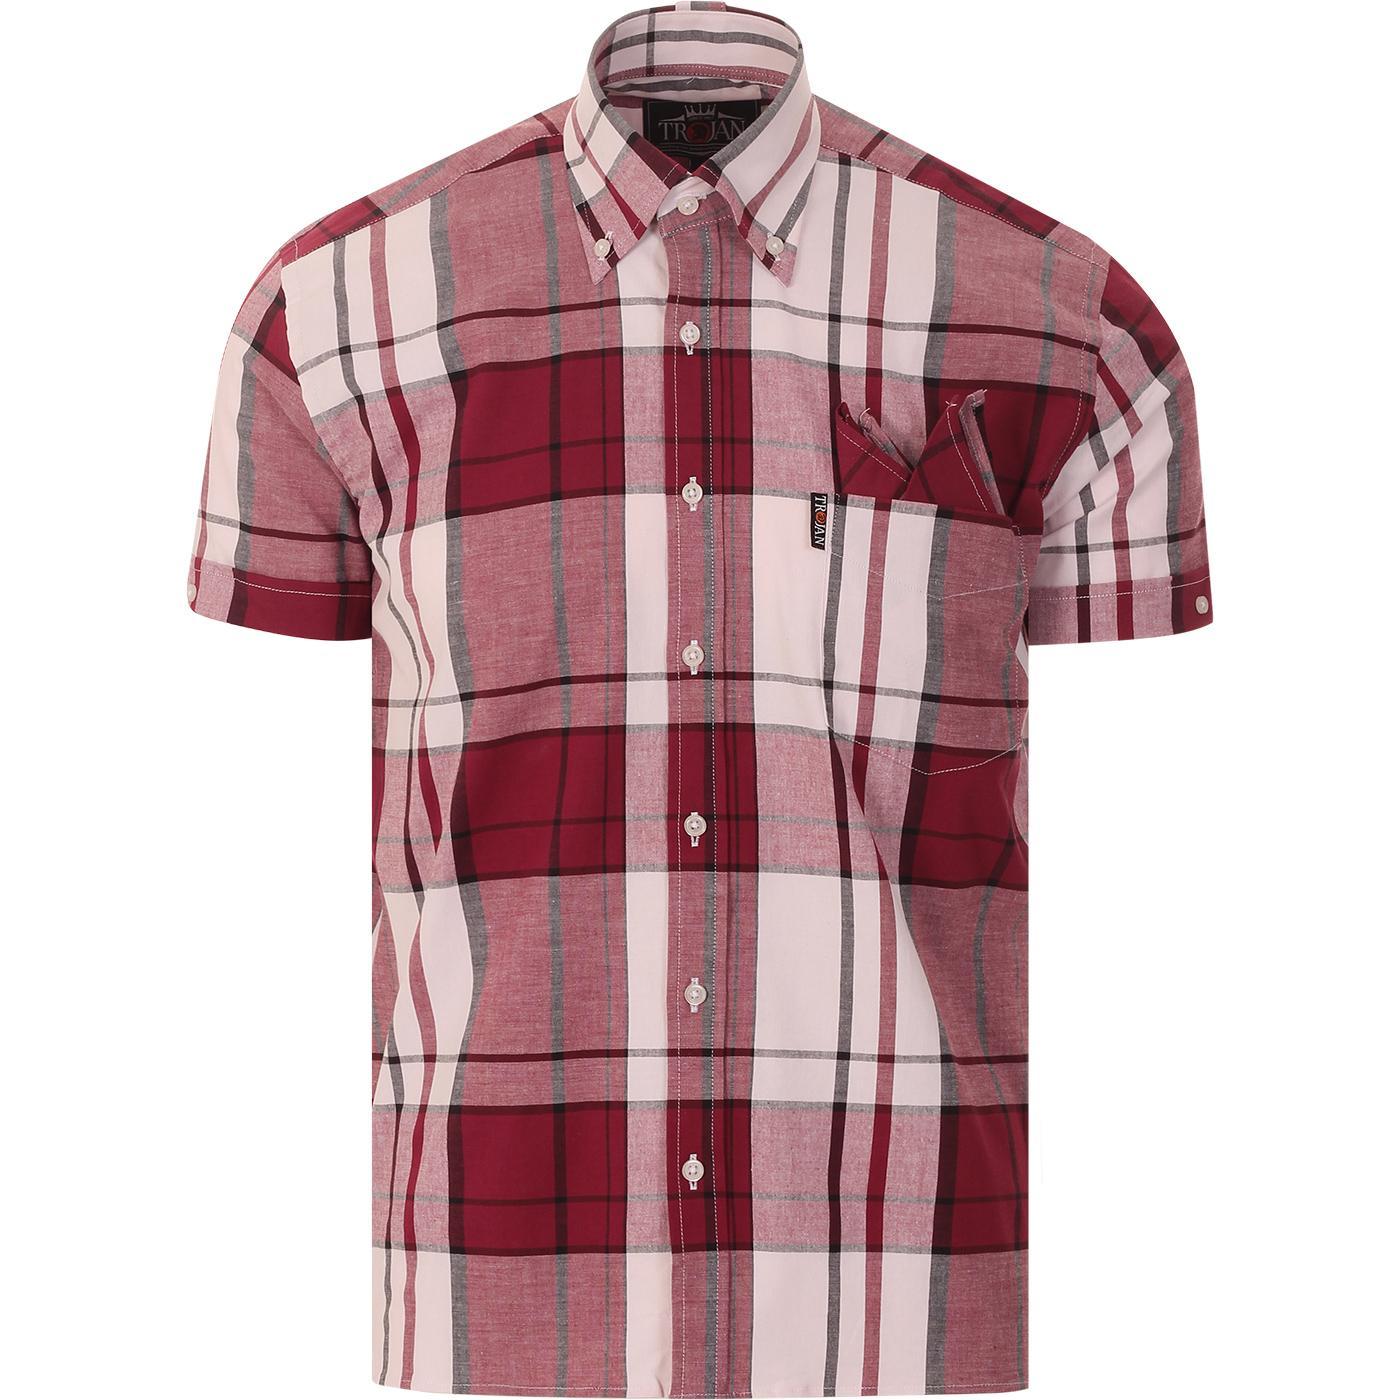 TROJAN RECORDS Mod Oversize Check BD Shirt (Port)